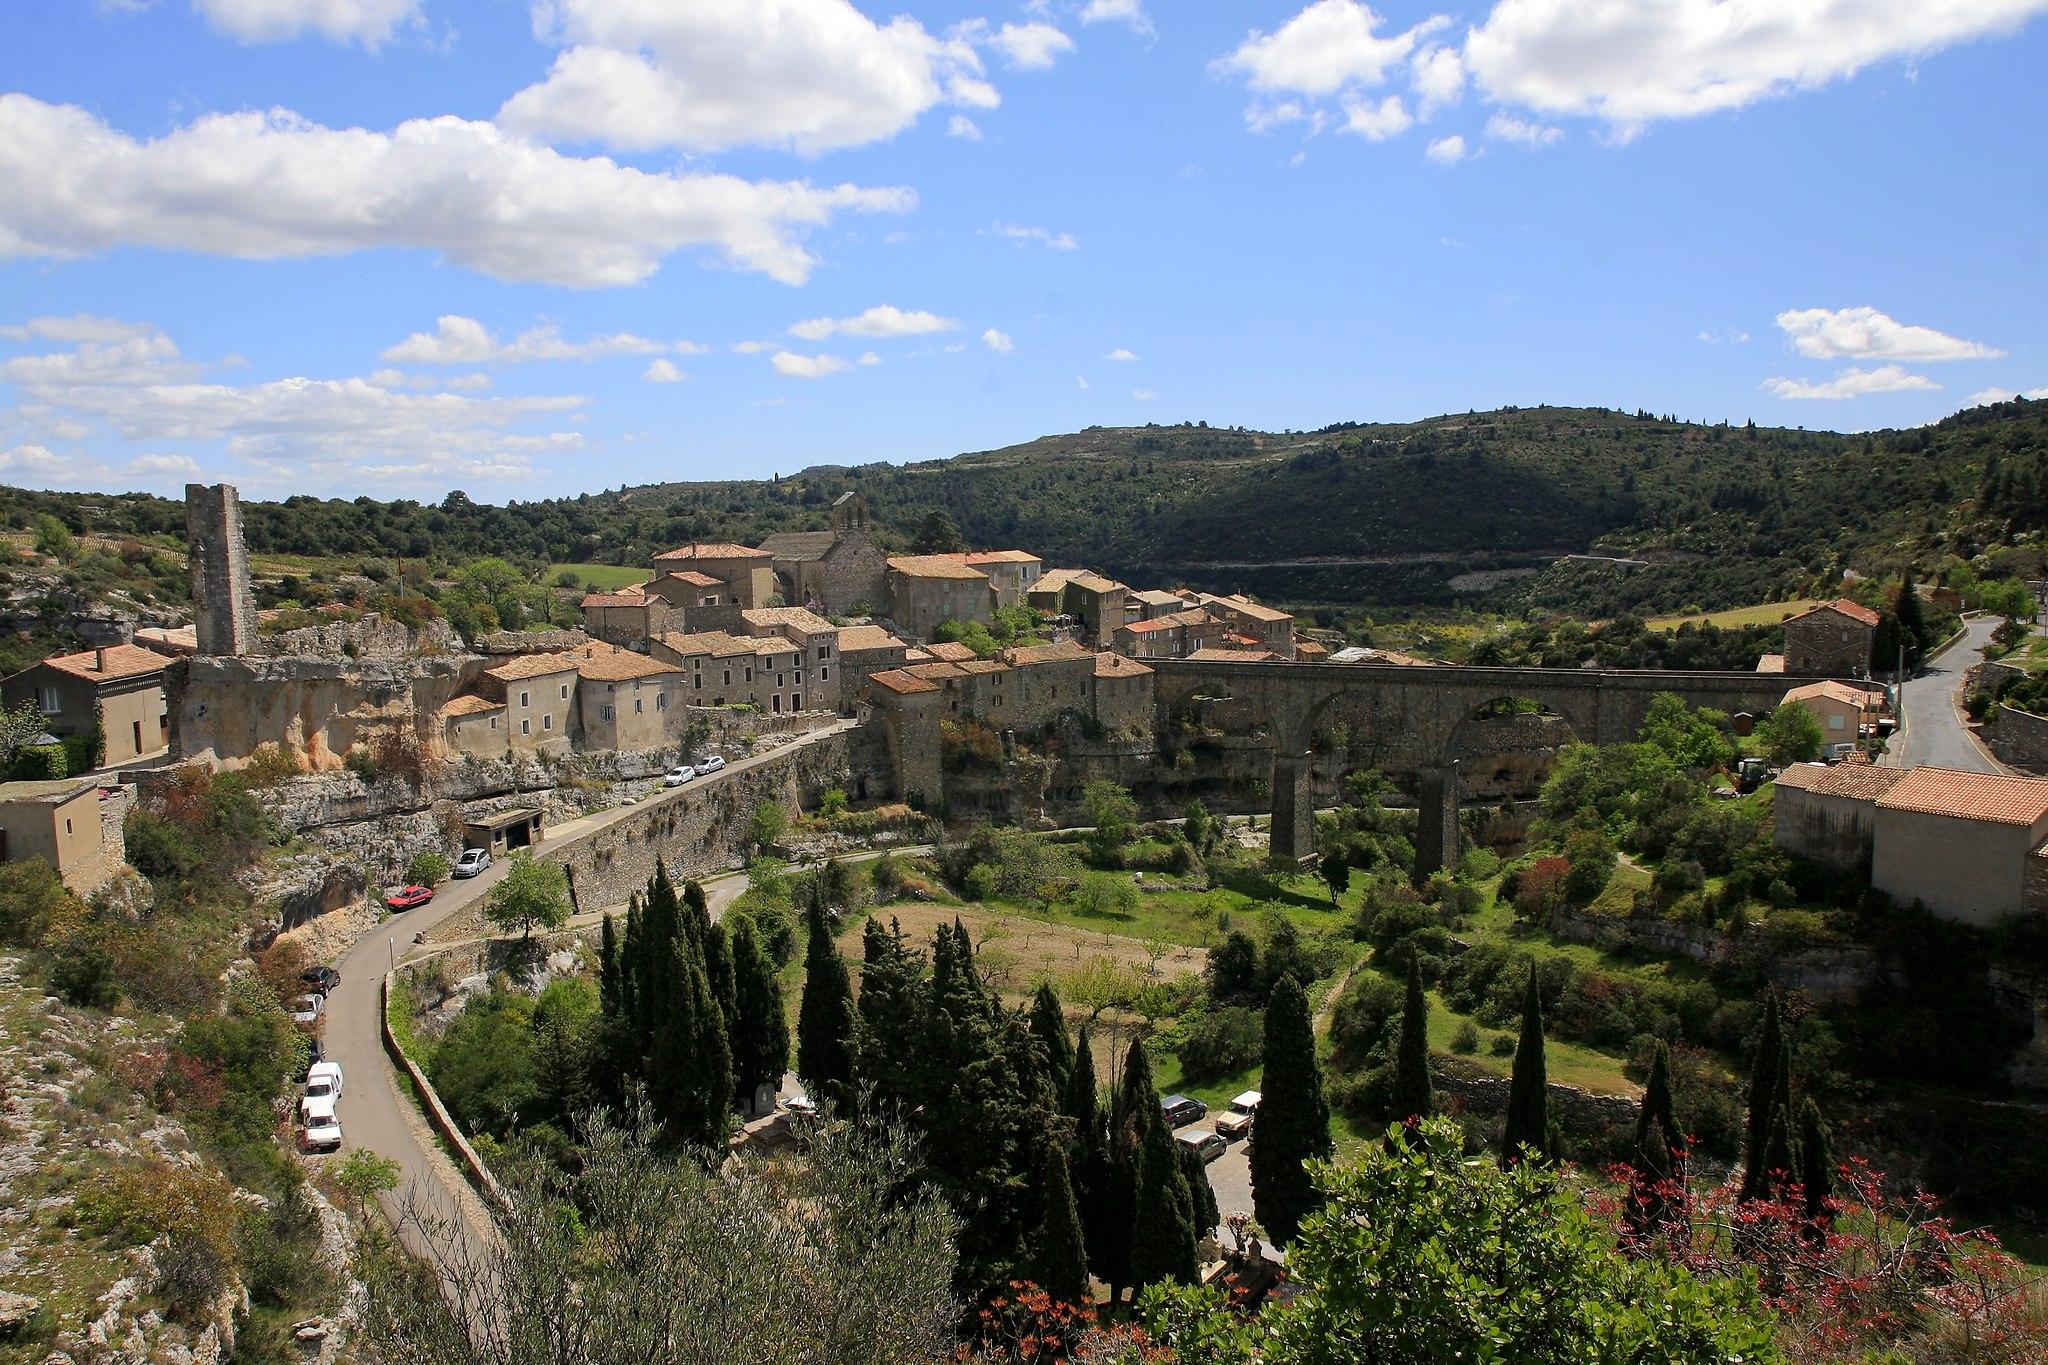 Minerve, Languedoc-Rousillon, Southern France